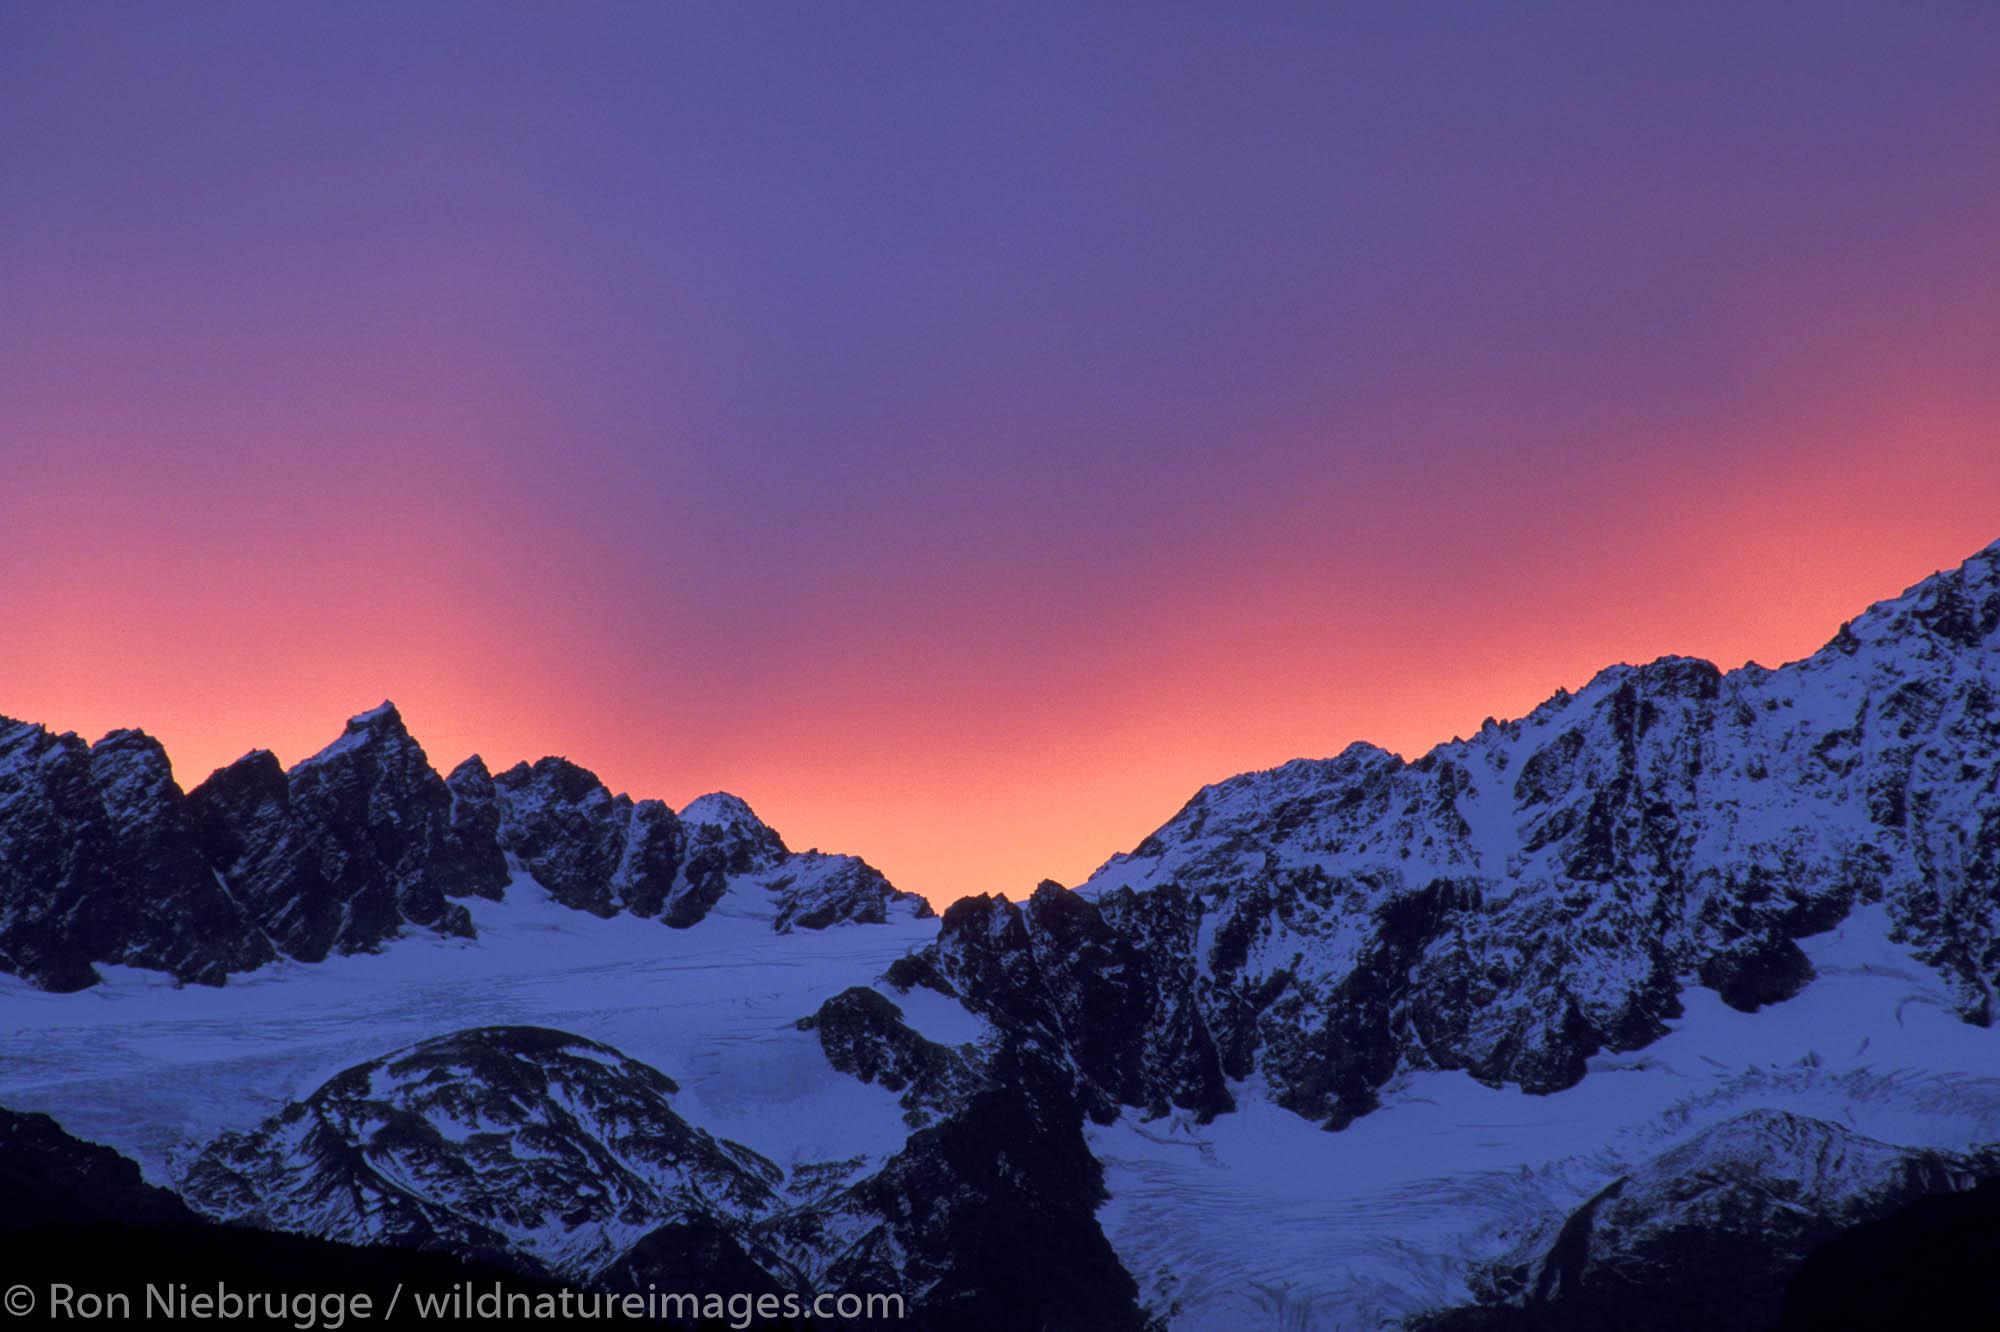 Winter Sunrise over Mt. Alice, Chugach National Forest, Seward, Alaska.